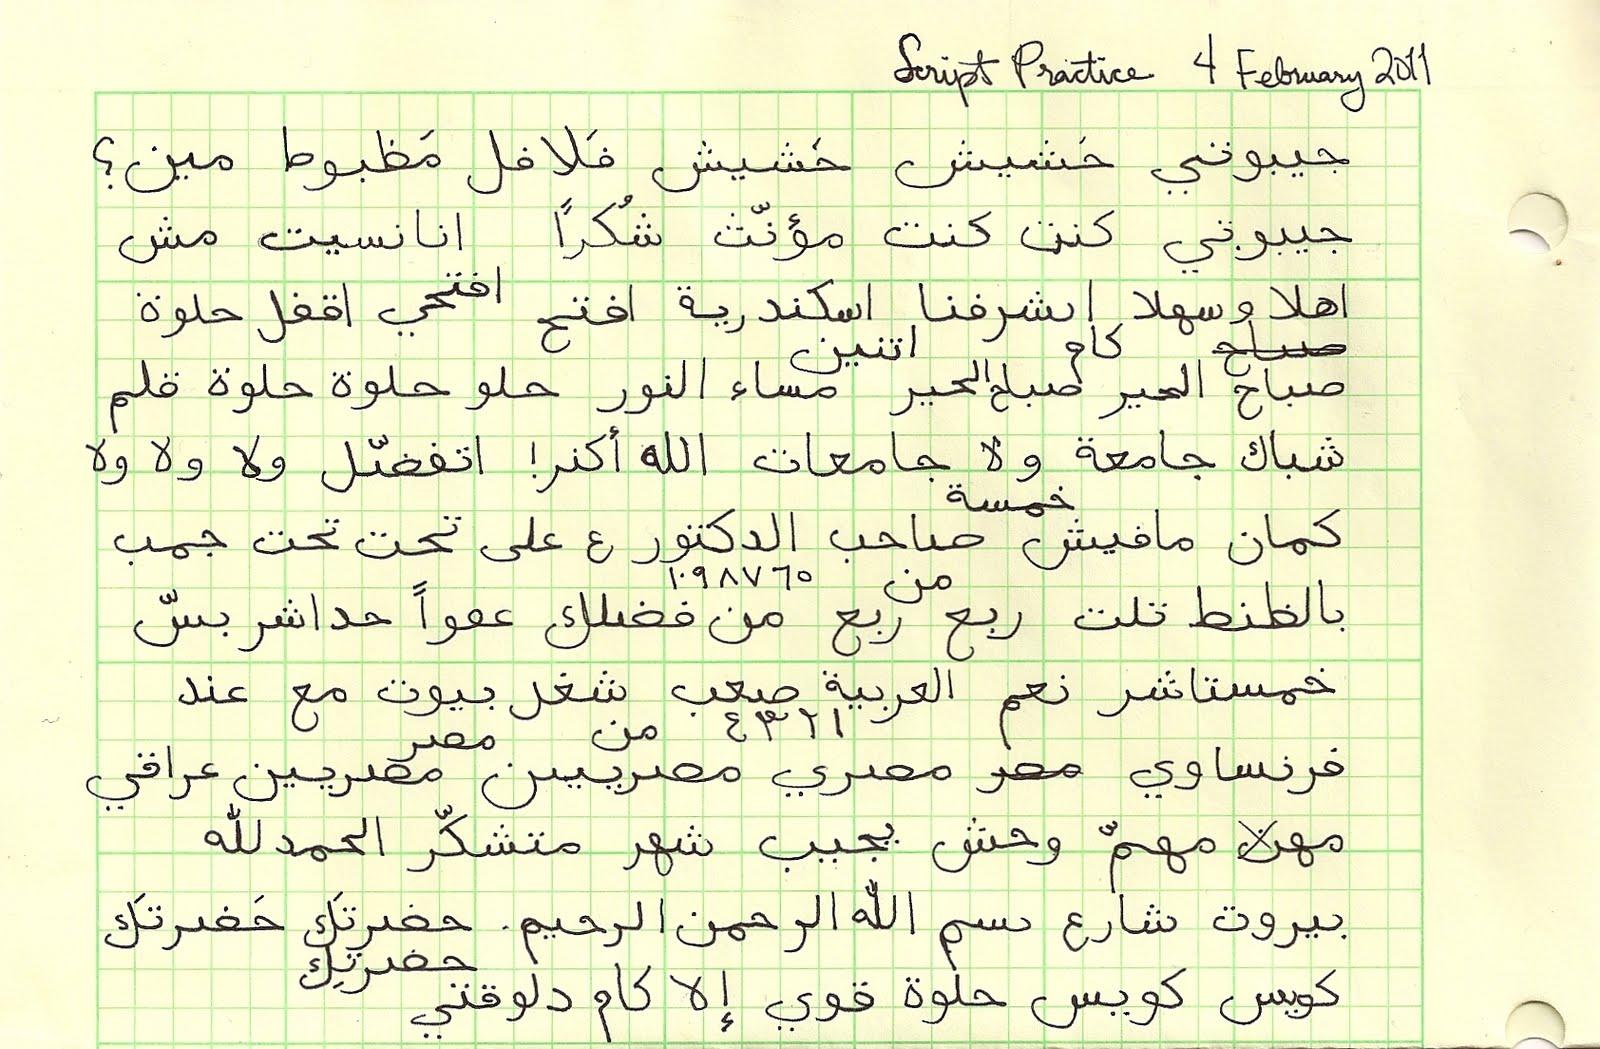 field of poppies: ألْعَرَبيَّة صَعْب (Arabic is hard.)